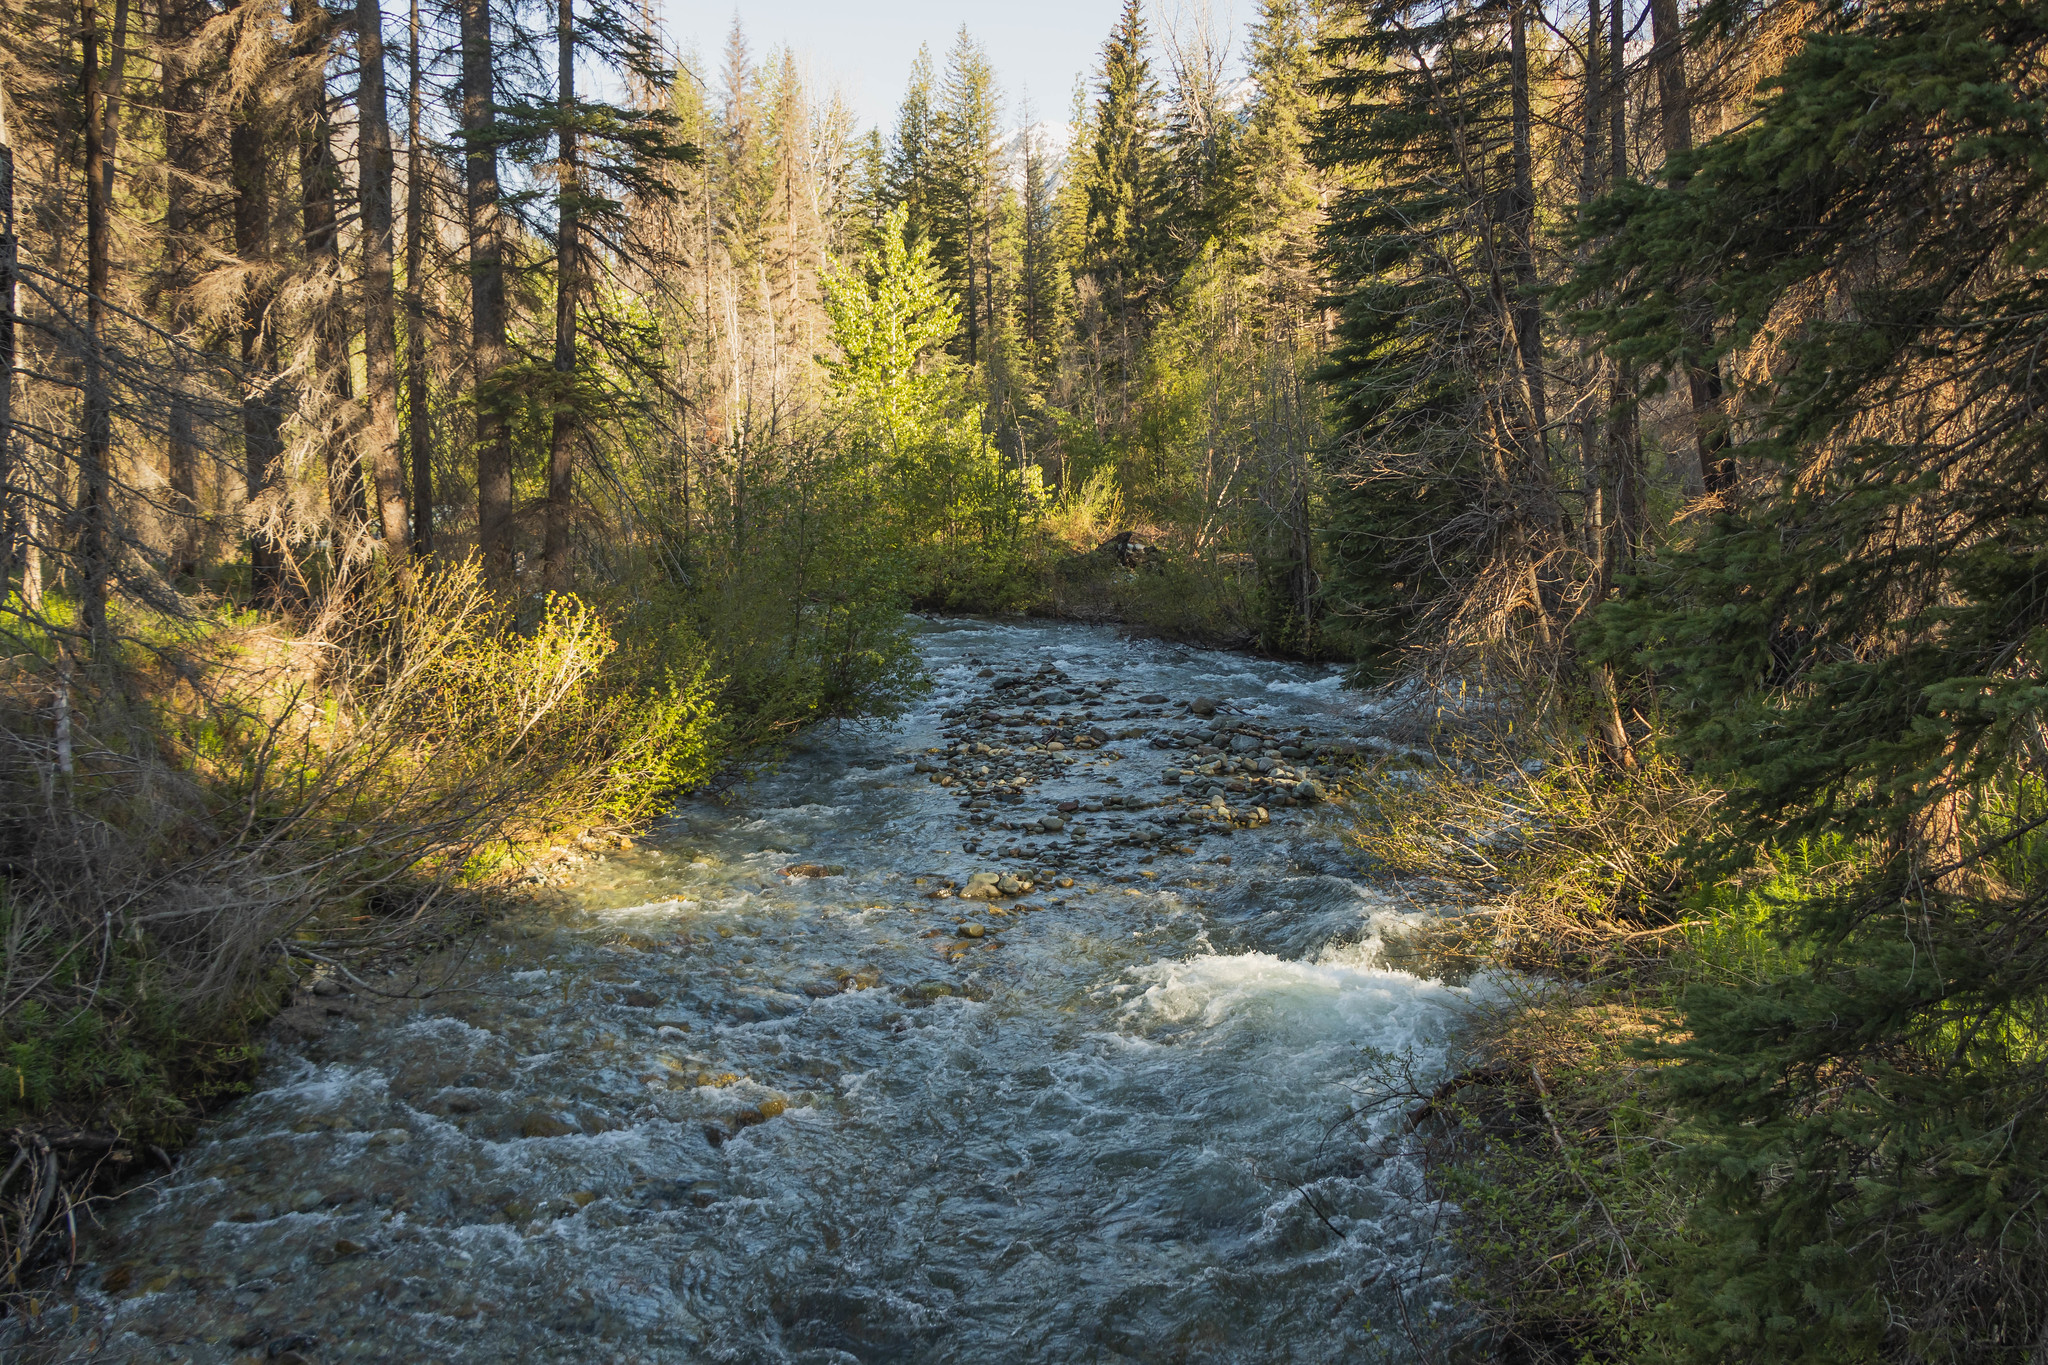 Twisp River in the AM